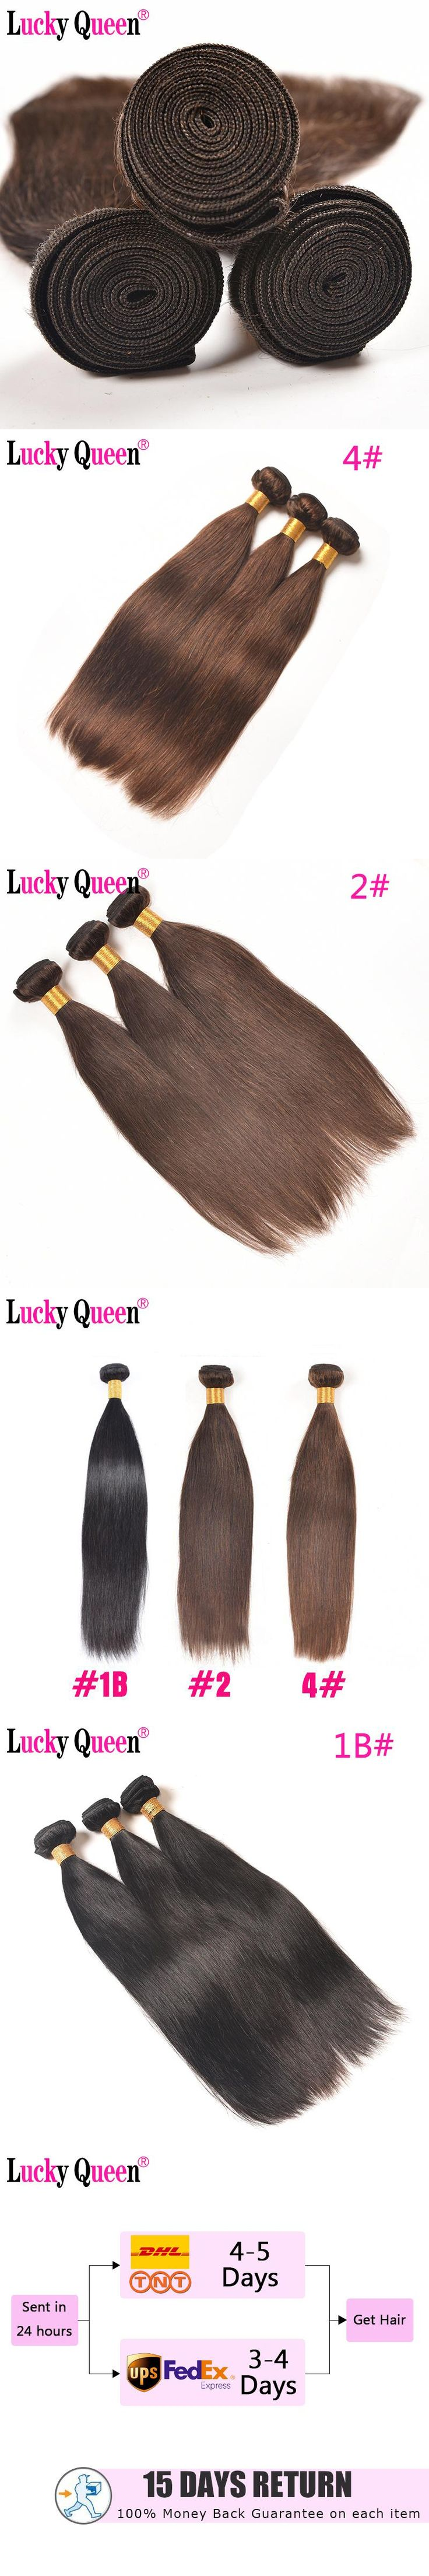 "Brazilian Straight Hair Weave Bundles 100% Human Hair Bundles 1B#, 2#, 4# Color Lucky Queen Hair Products ""8-28"" Non-Remy Hair"